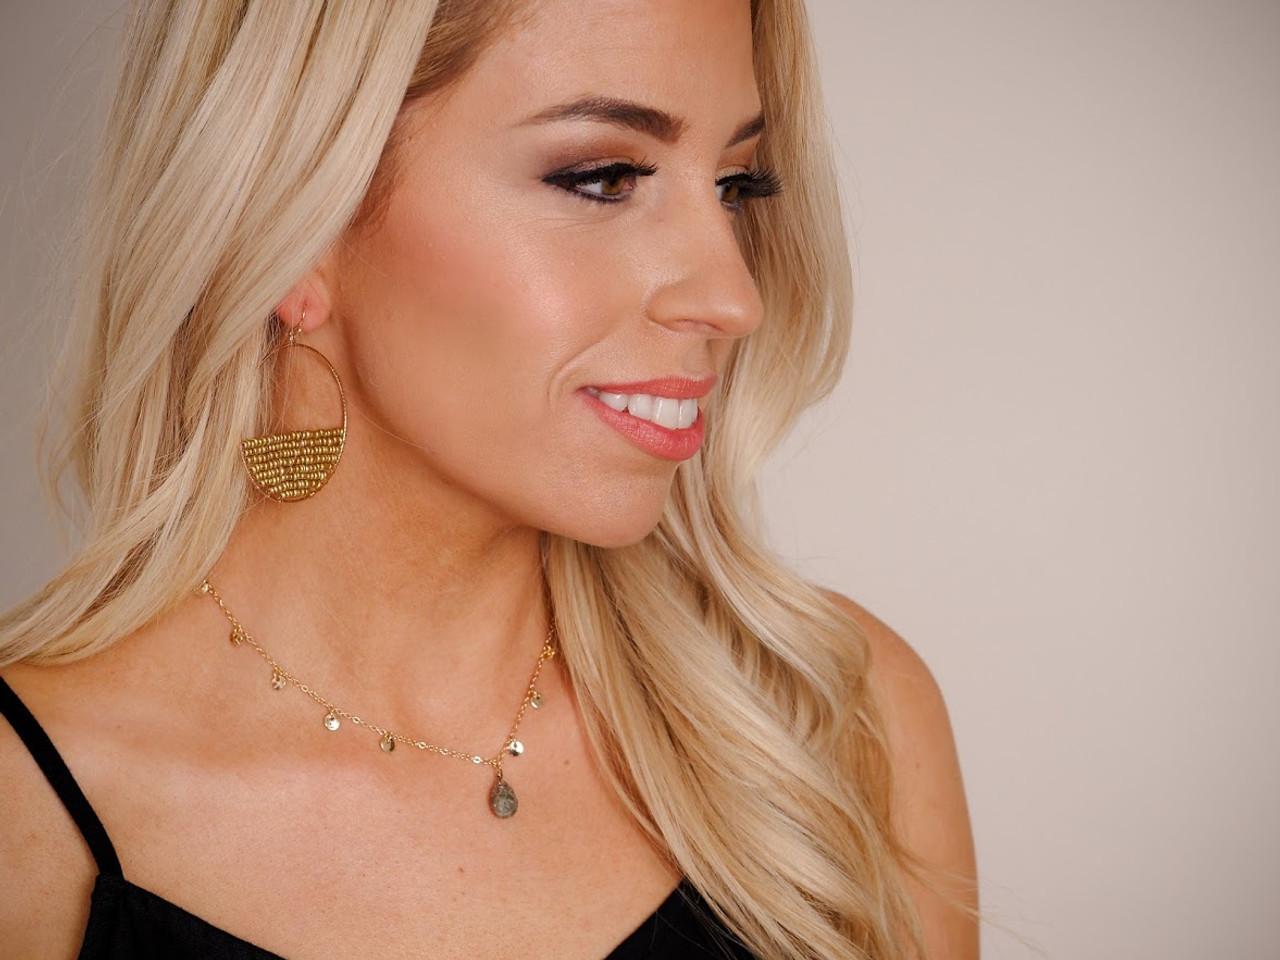 Woman in Black Tanktop Models Gold Jewelry